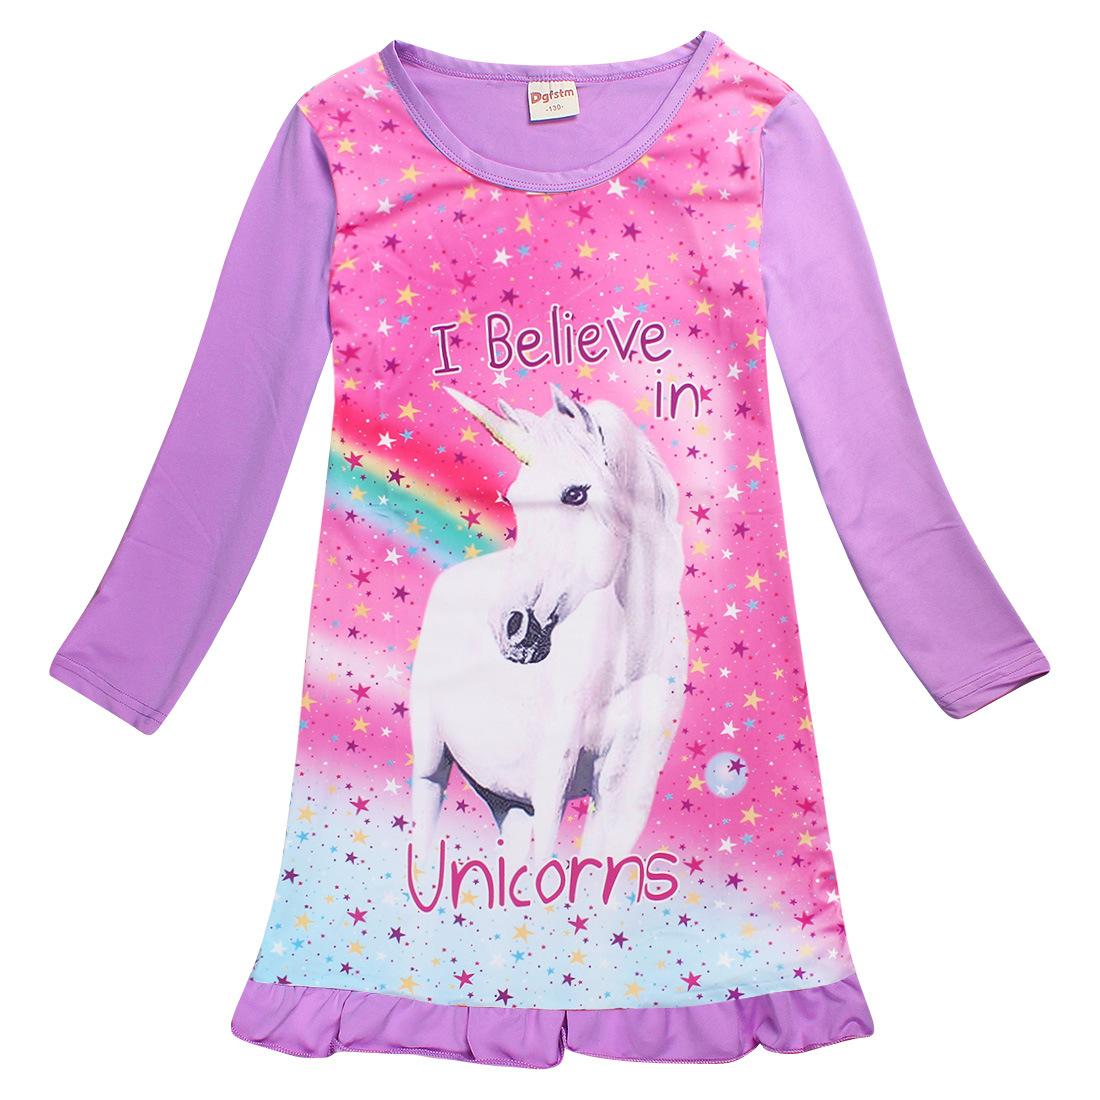 4ed41a3a3904 Unicorn Girls Sleeping Dress Toddler Girl Nightgown Long Sleeved Children  Princess Nightdress Pajamas Nightgown Dress Nightwear Material   100 %Polyester